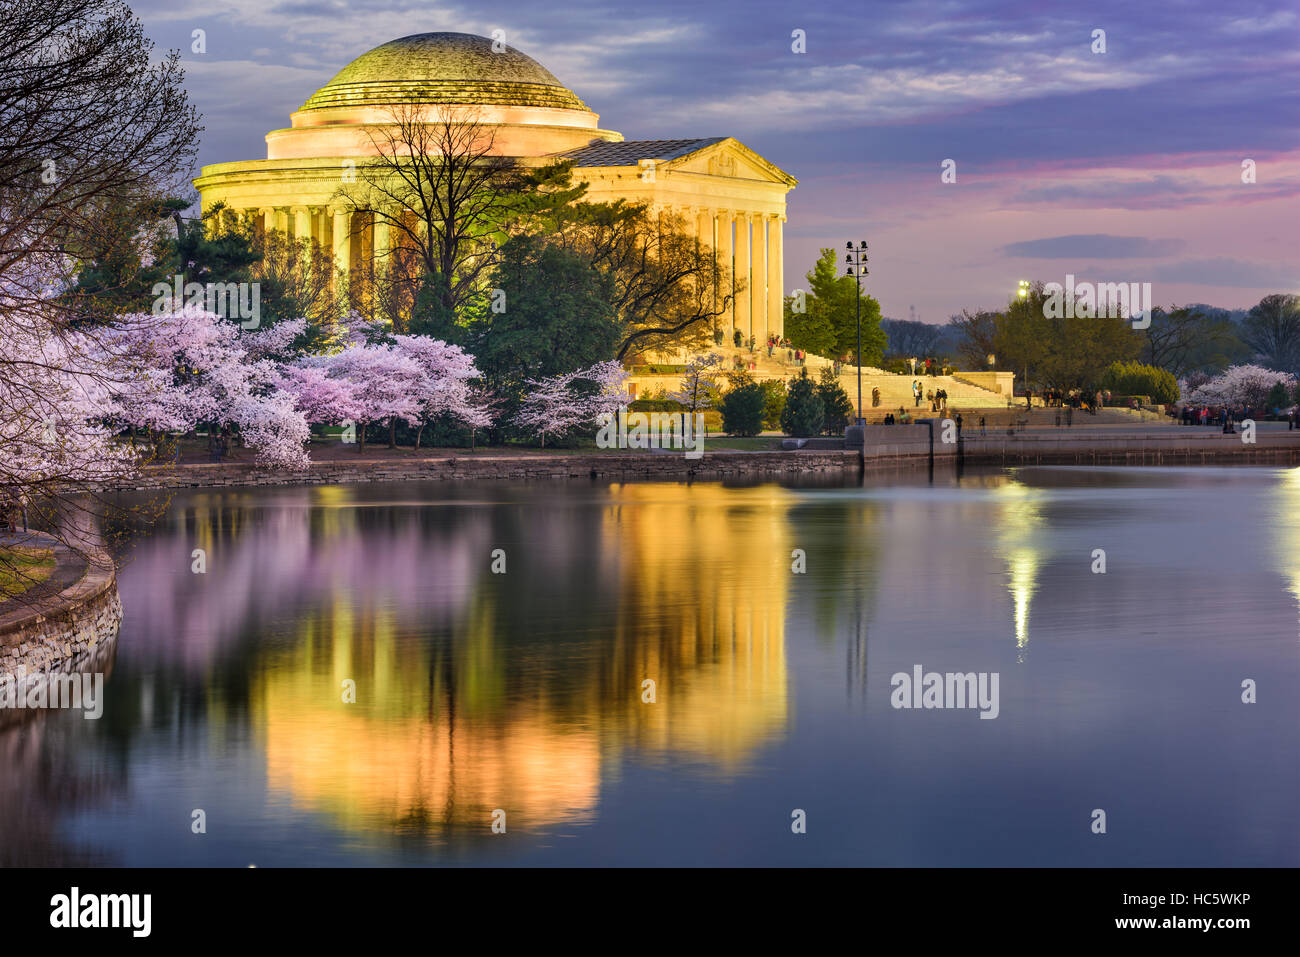 Washington, DC at the Jefferson Memorial during spring. - Stock Image